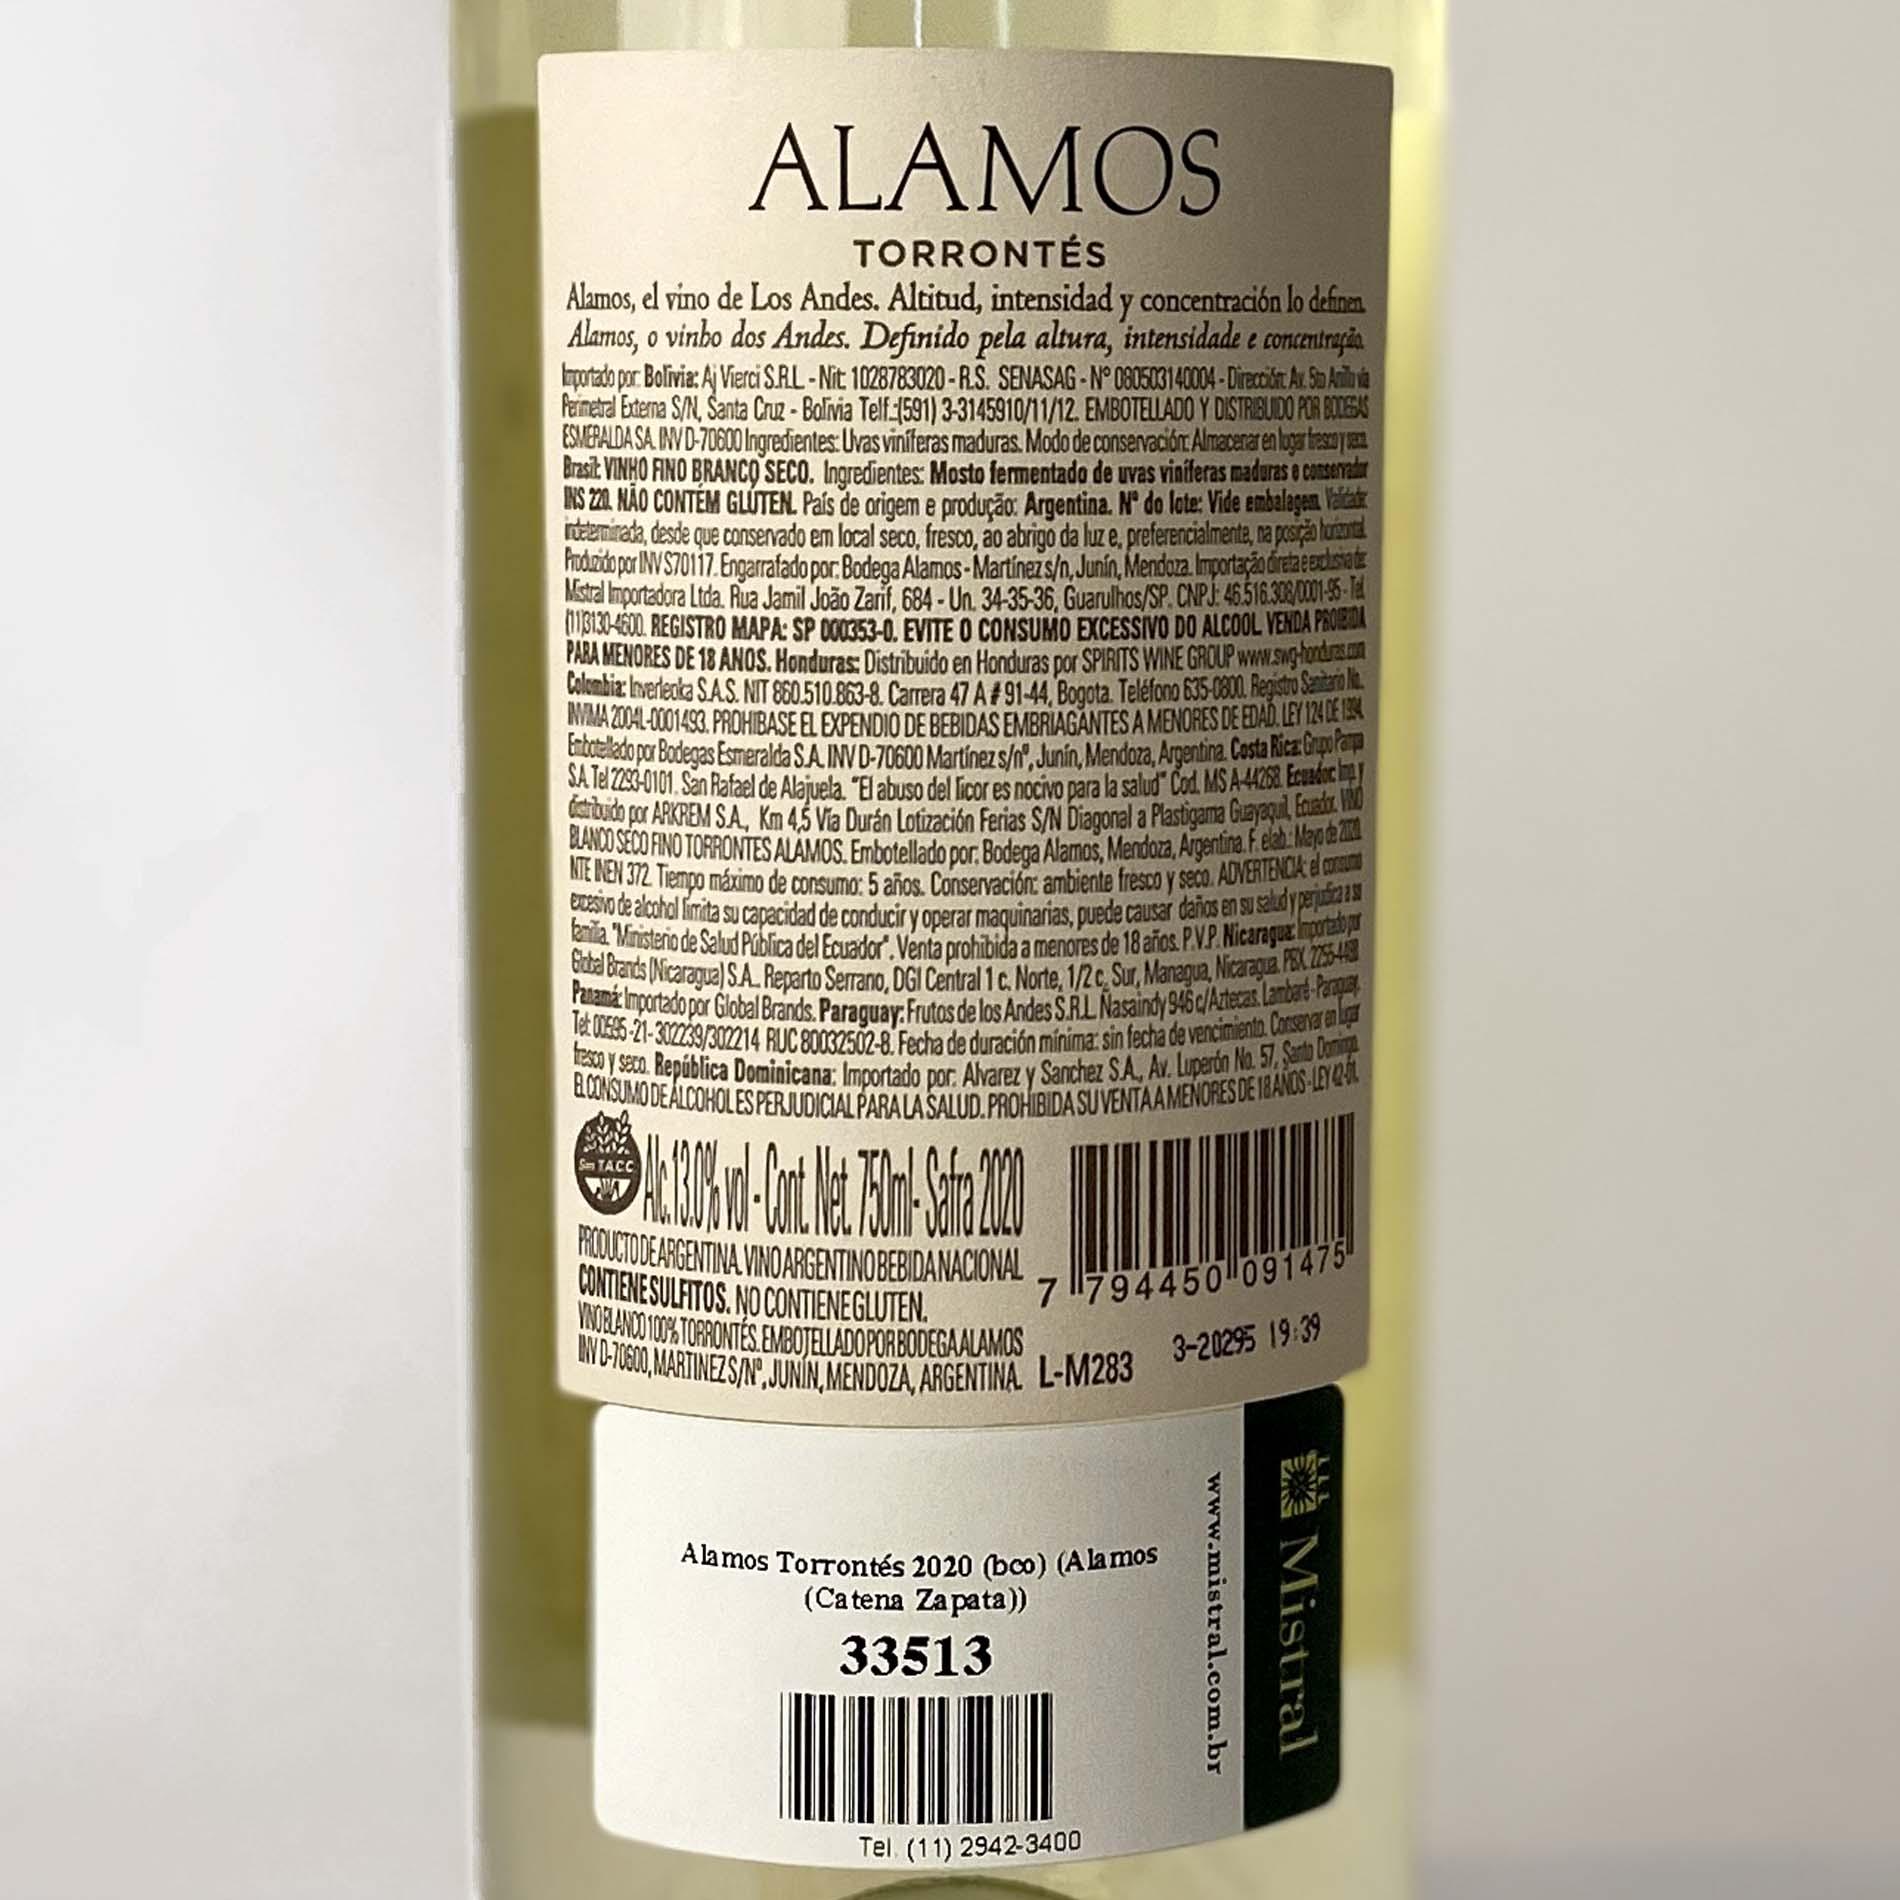 Alamos Torrontés  - Vinerize